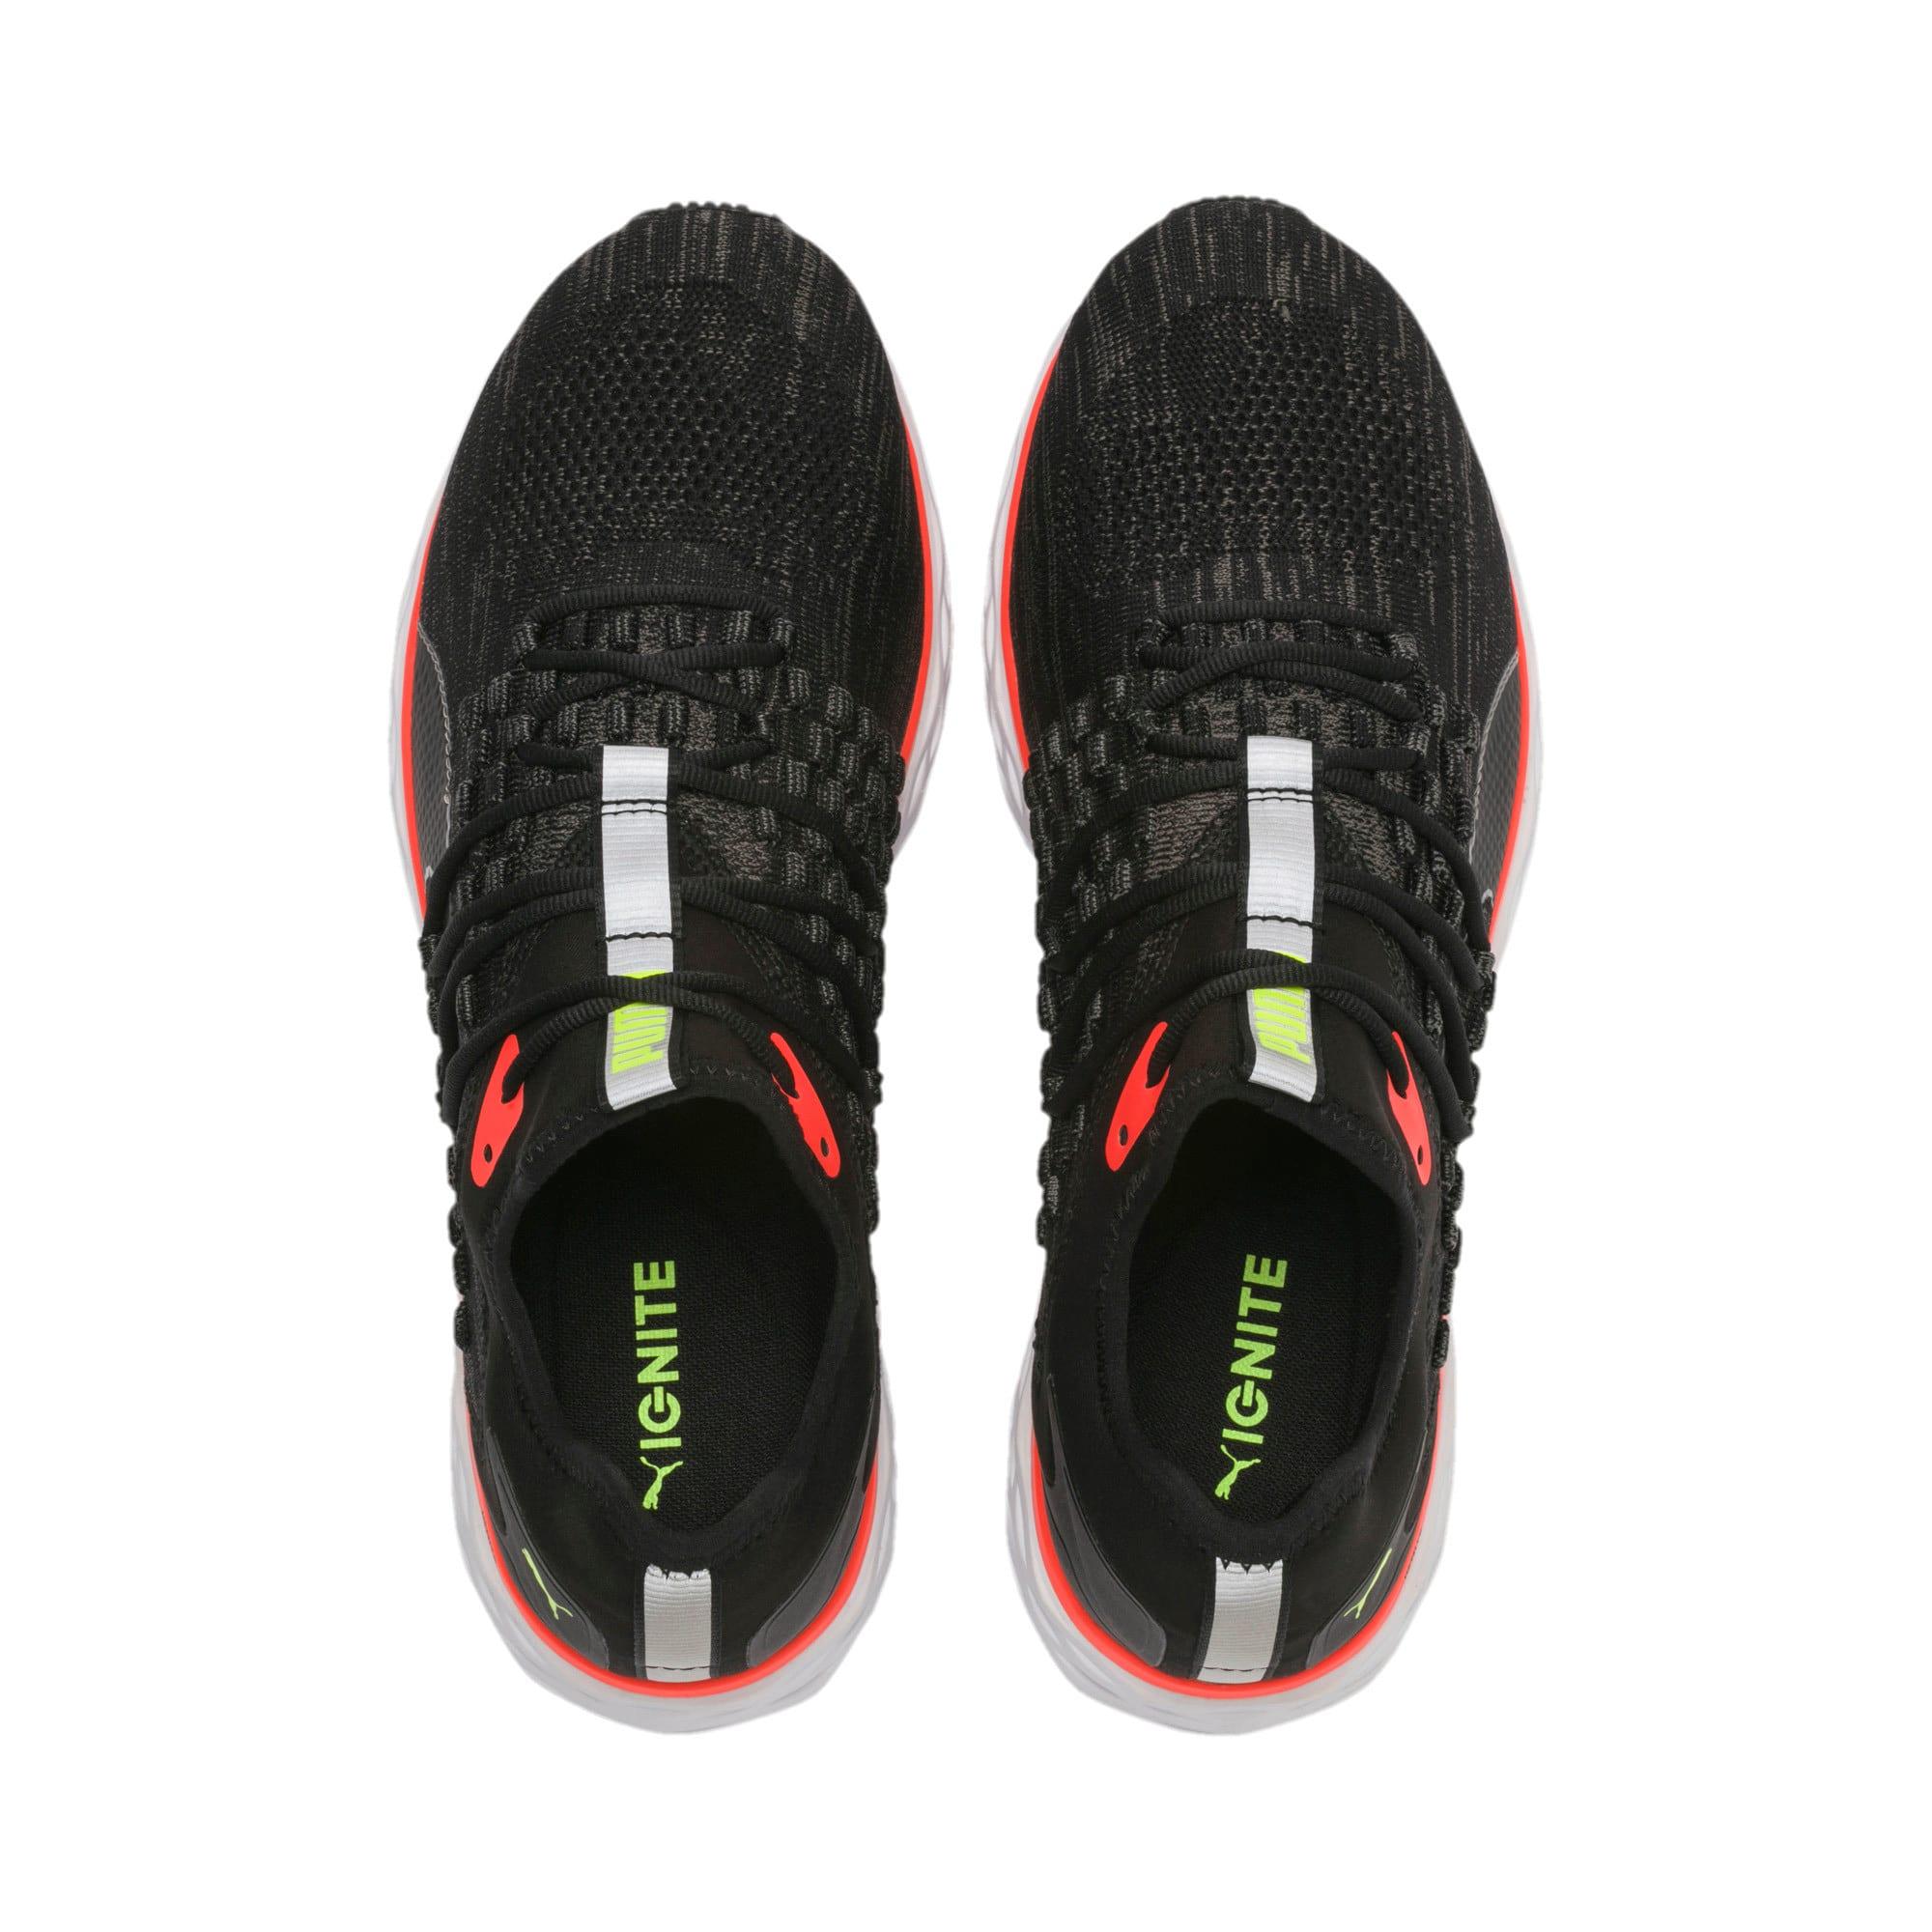 Thumbnail 7 of SPEED FUSEFIT Men's Running Shoes, Puma Black-Nrgy Red, medium